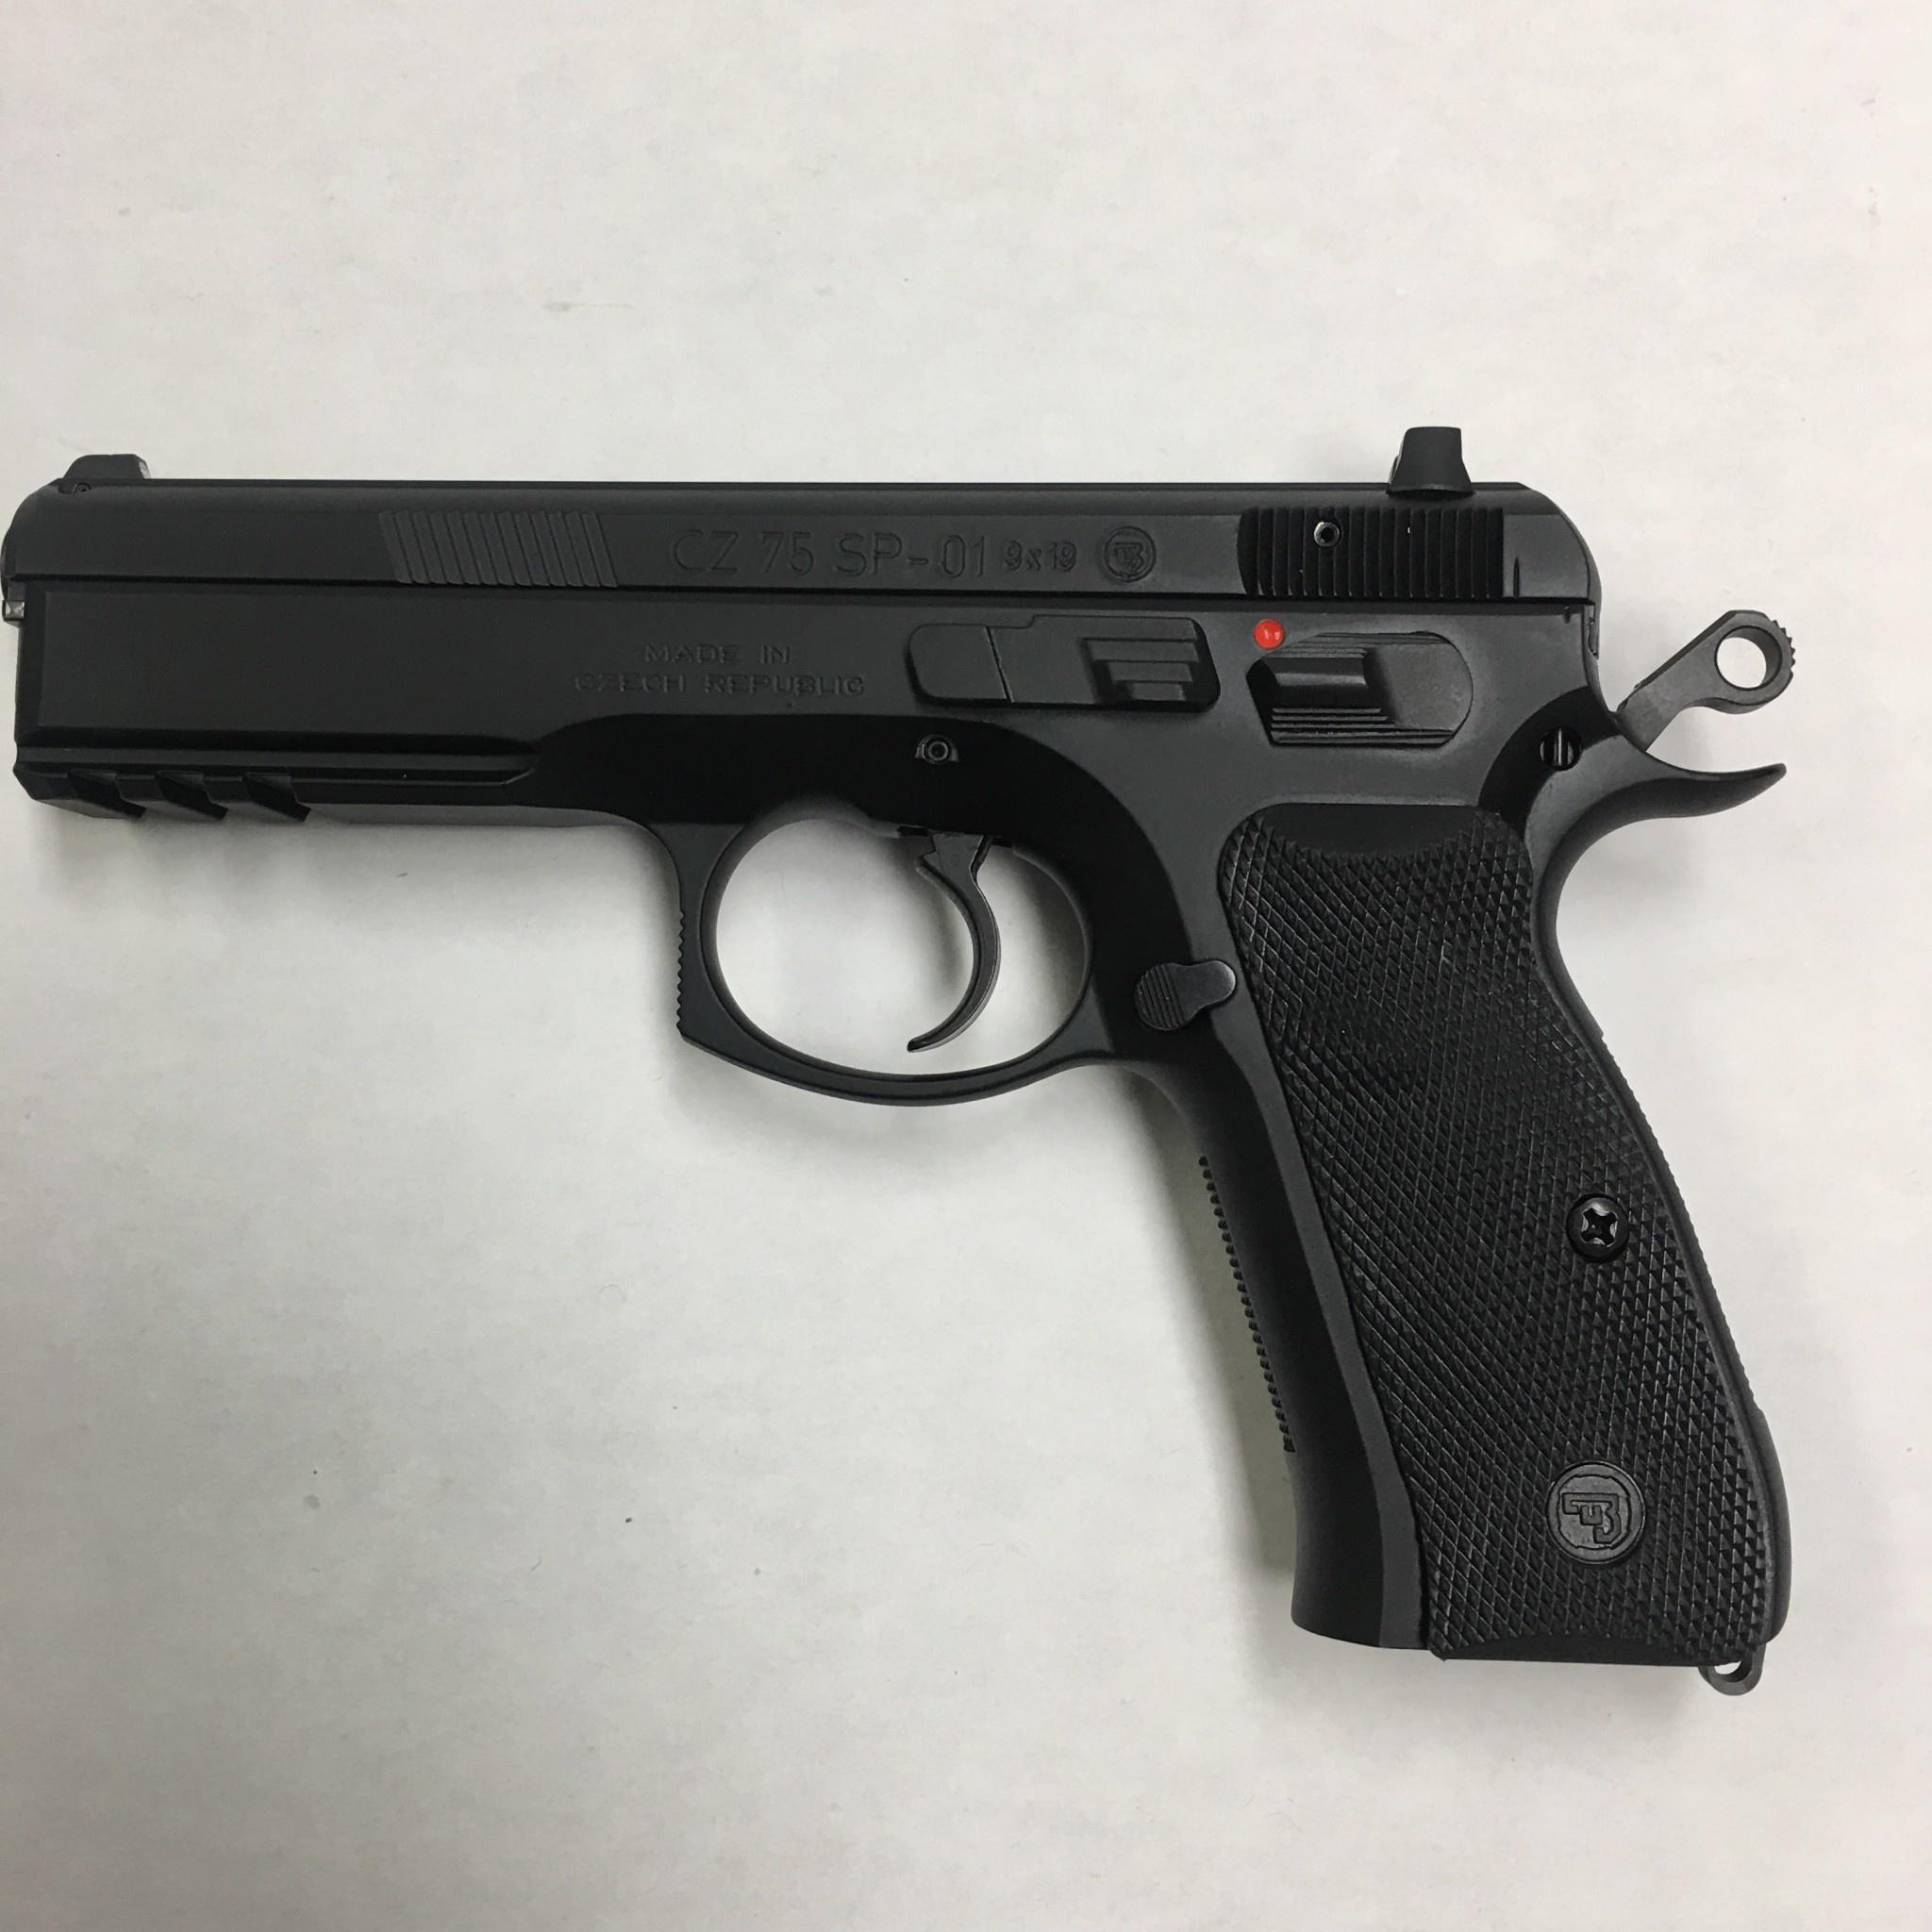 CZ-USA 75 SP-01 Pistol 9MM